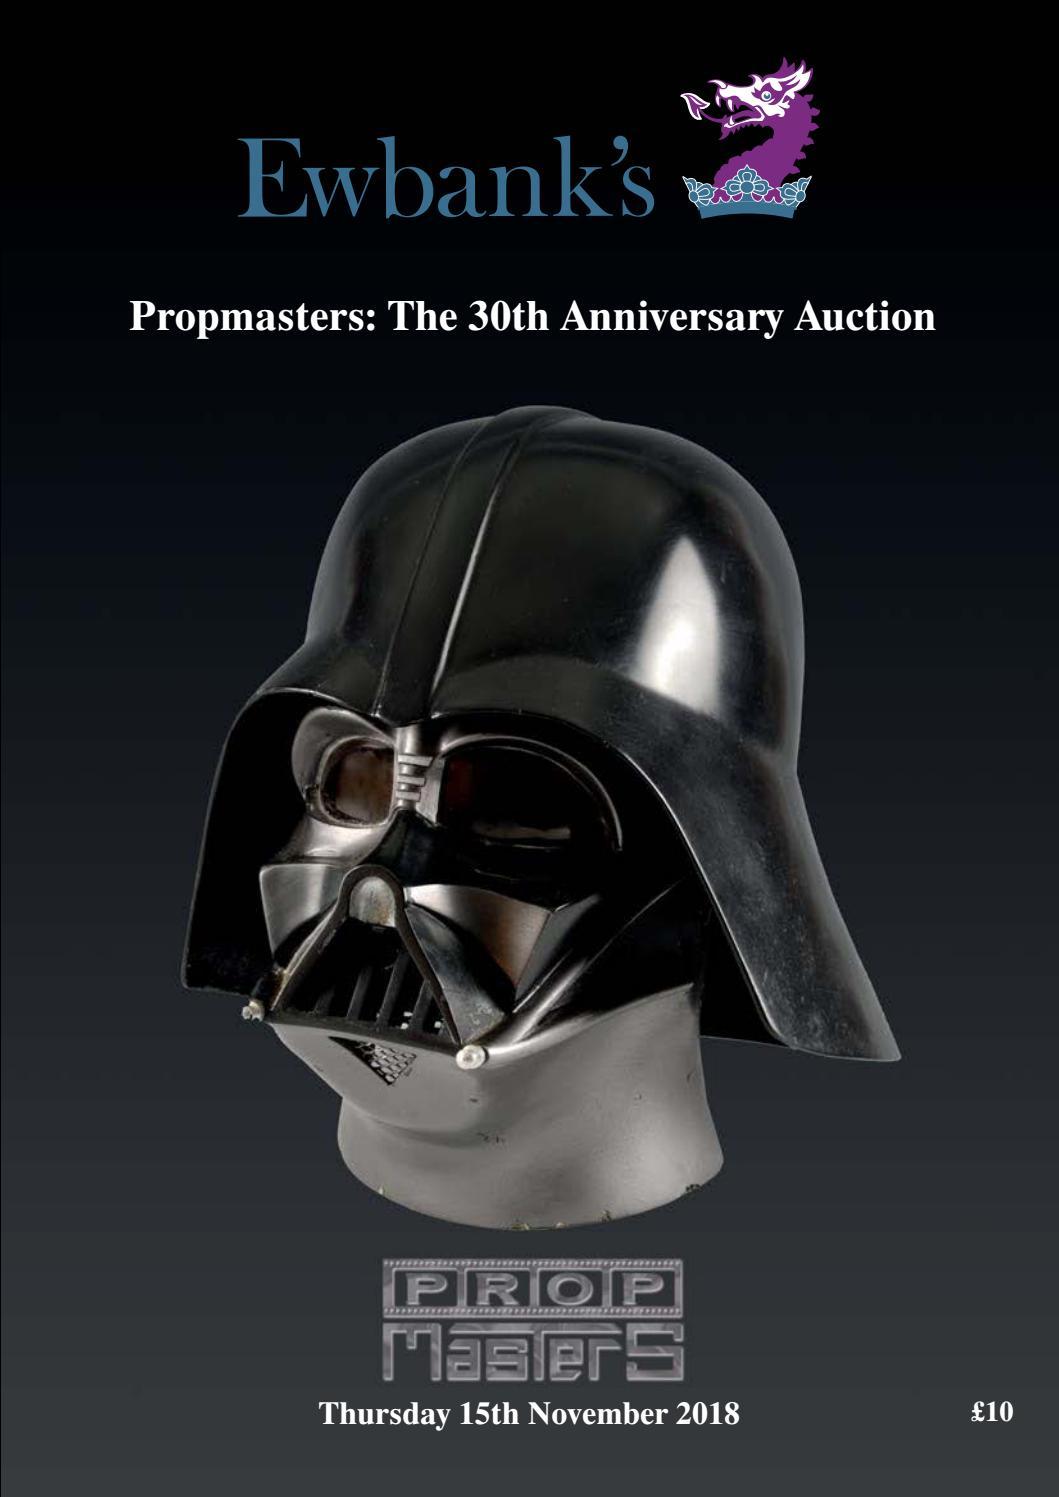 Star Trek Wars Luke Darth Vader United Federation of Planets Enterprise T-Shirt Maglietta T-Shirt 317